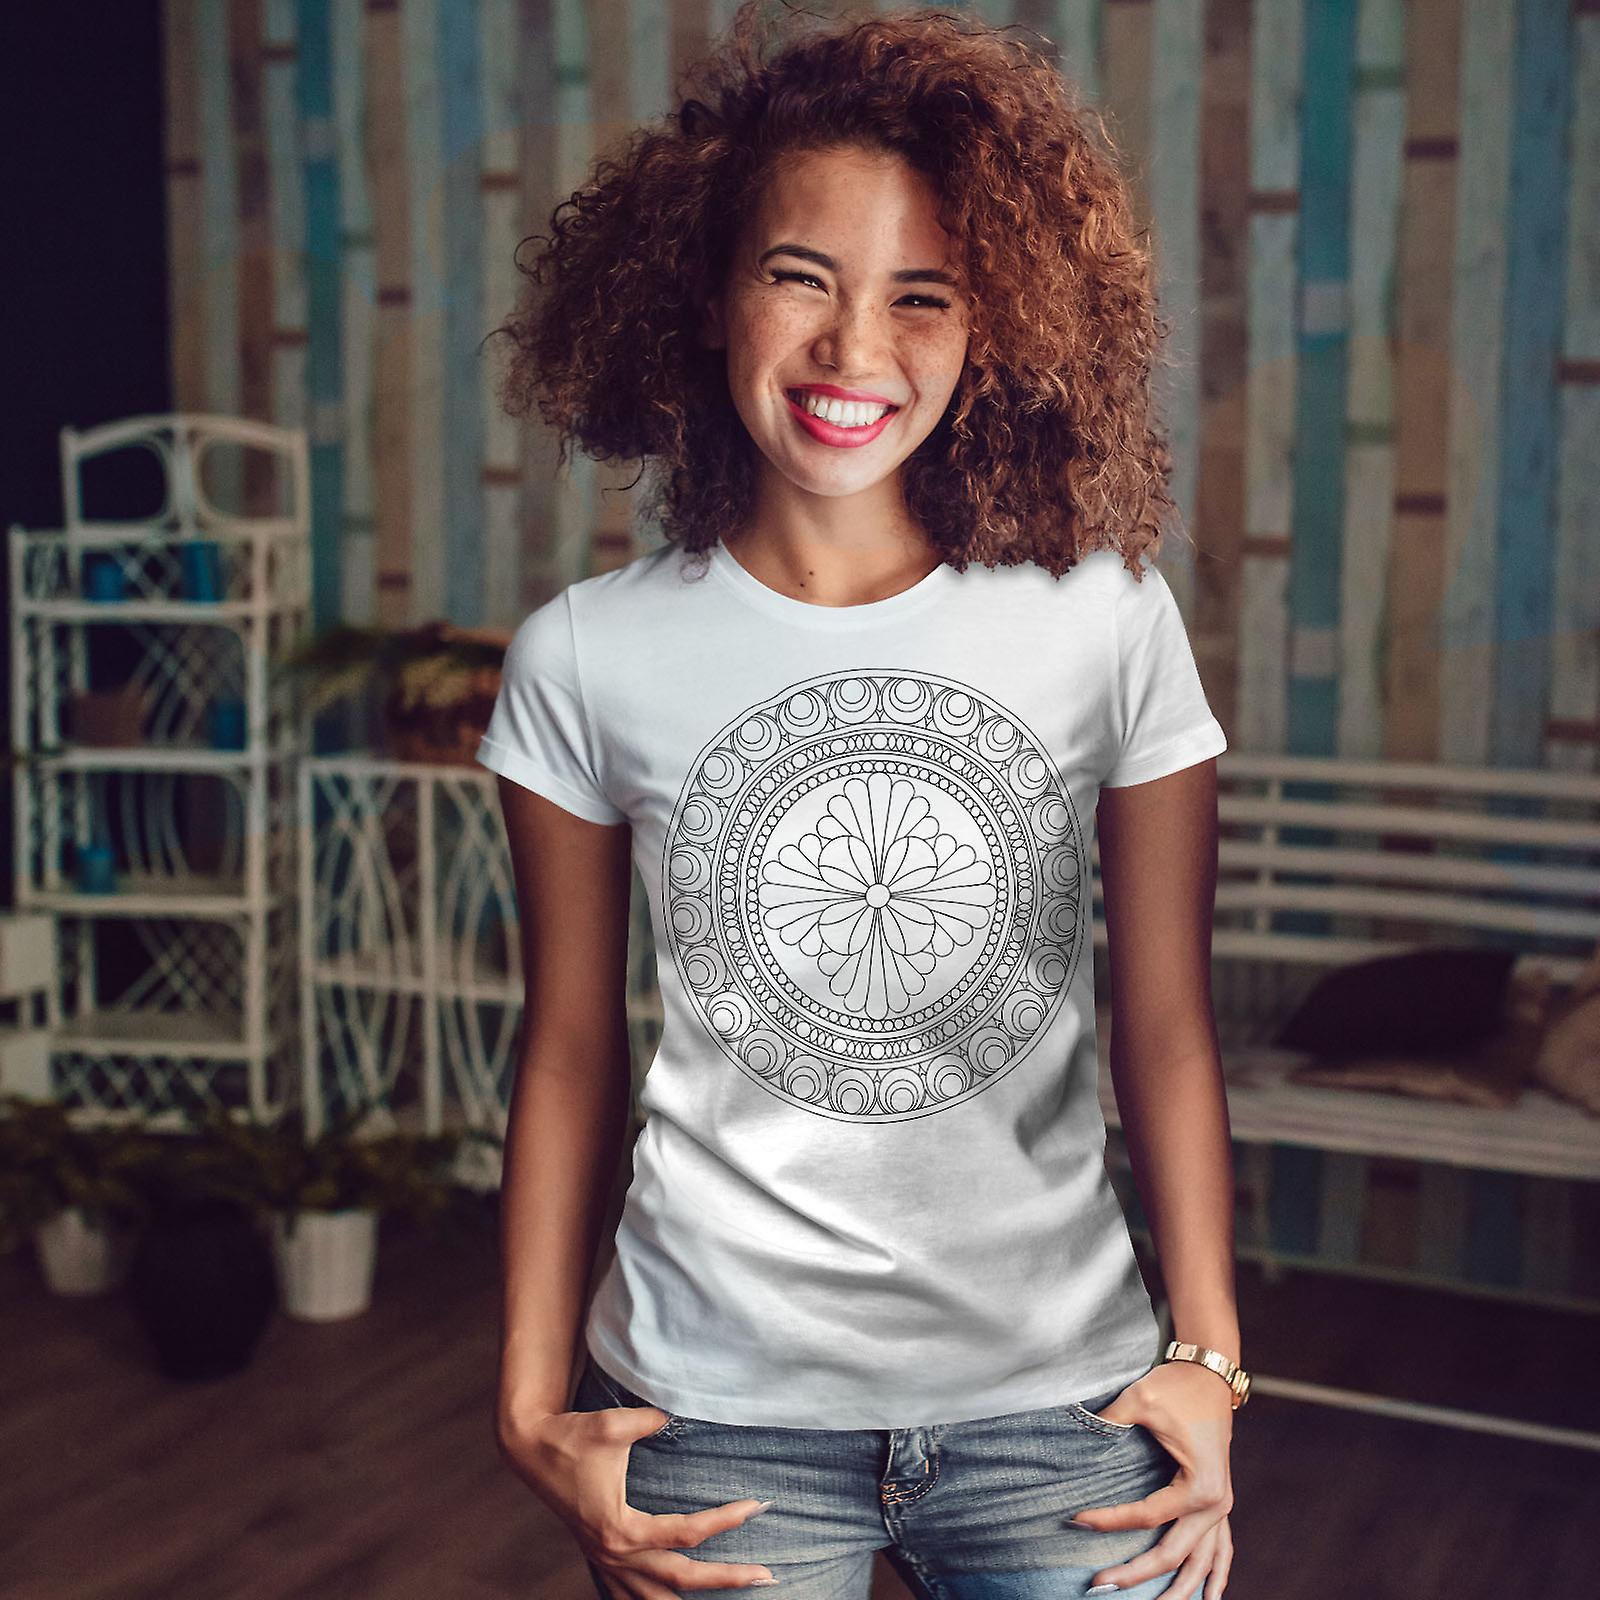 Mandala WhiteT-shirt femme   Wellcoda